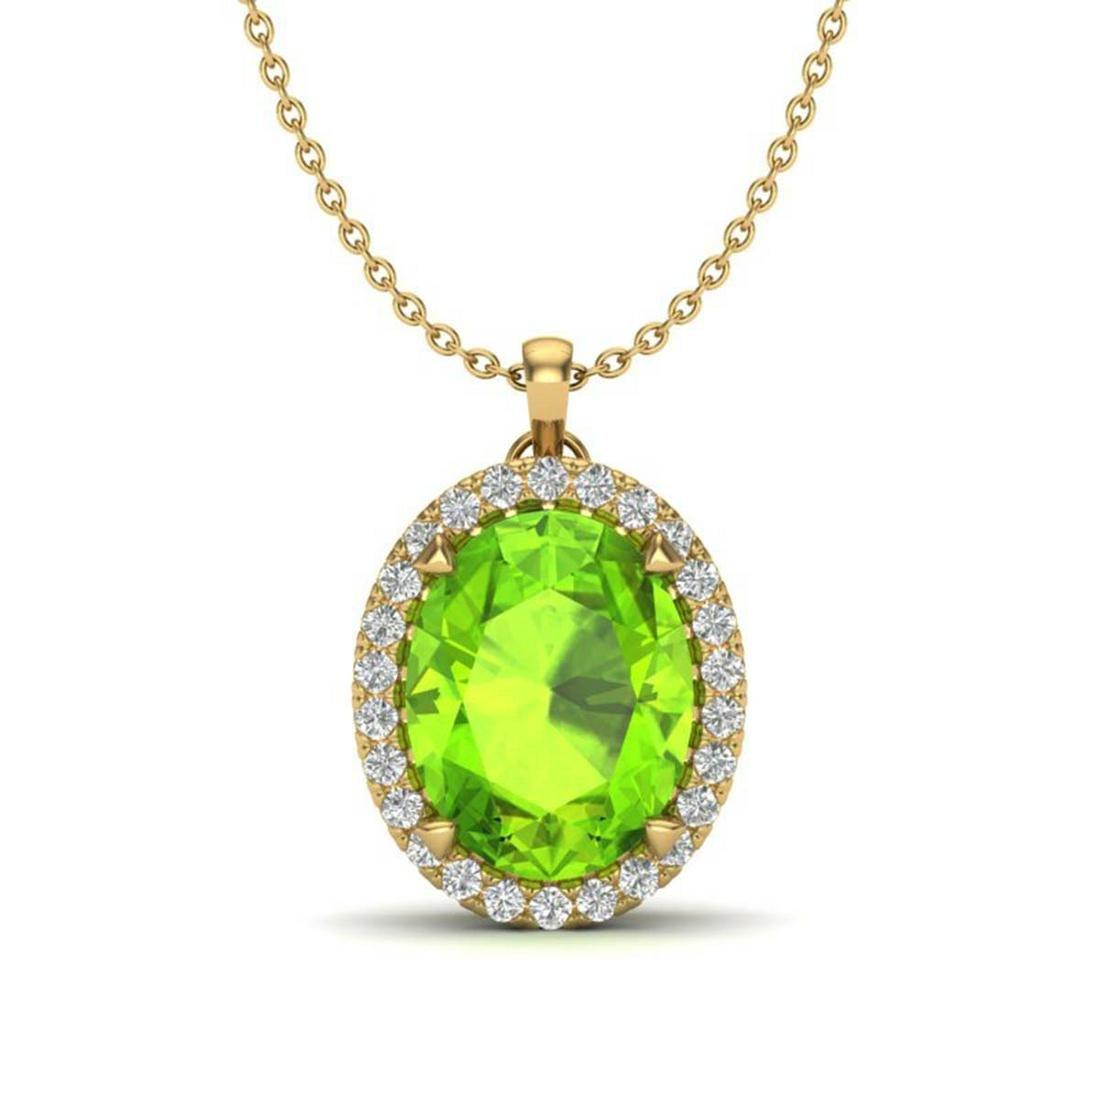 2.75 ctw Peridot & VS/SI Diamond Halo Necklace 18K